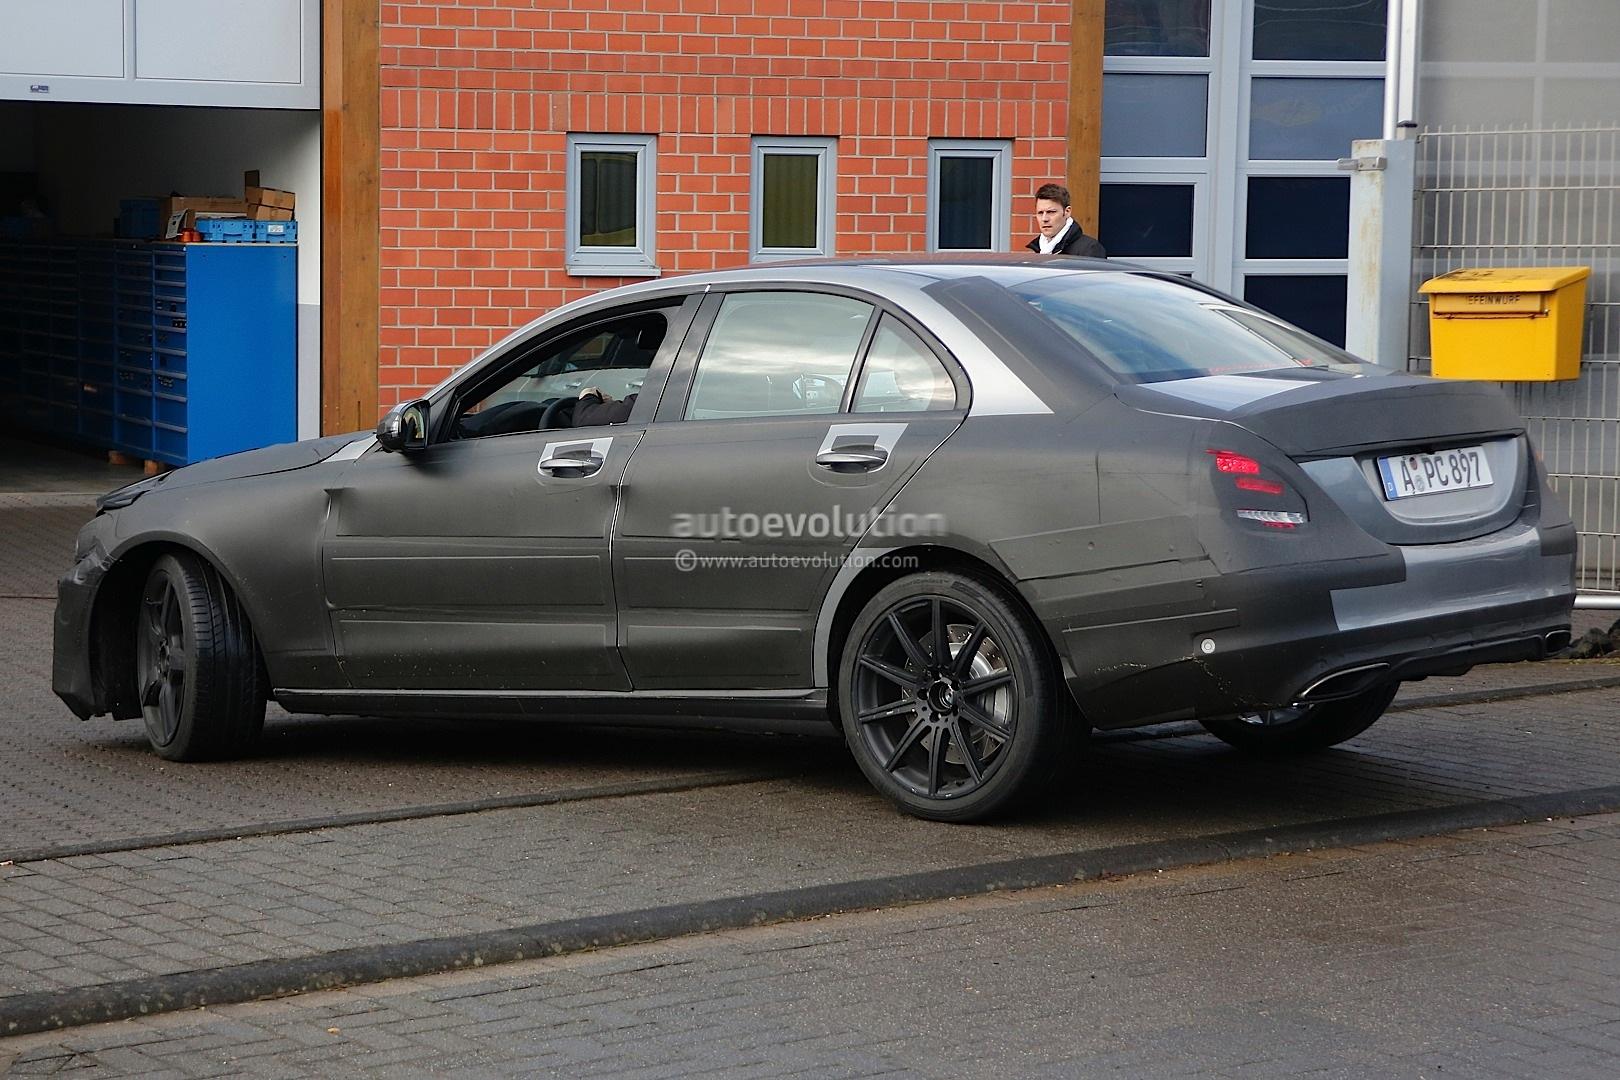 Mercedes c55 amg 2014 images for Mercedes benz c55 amg